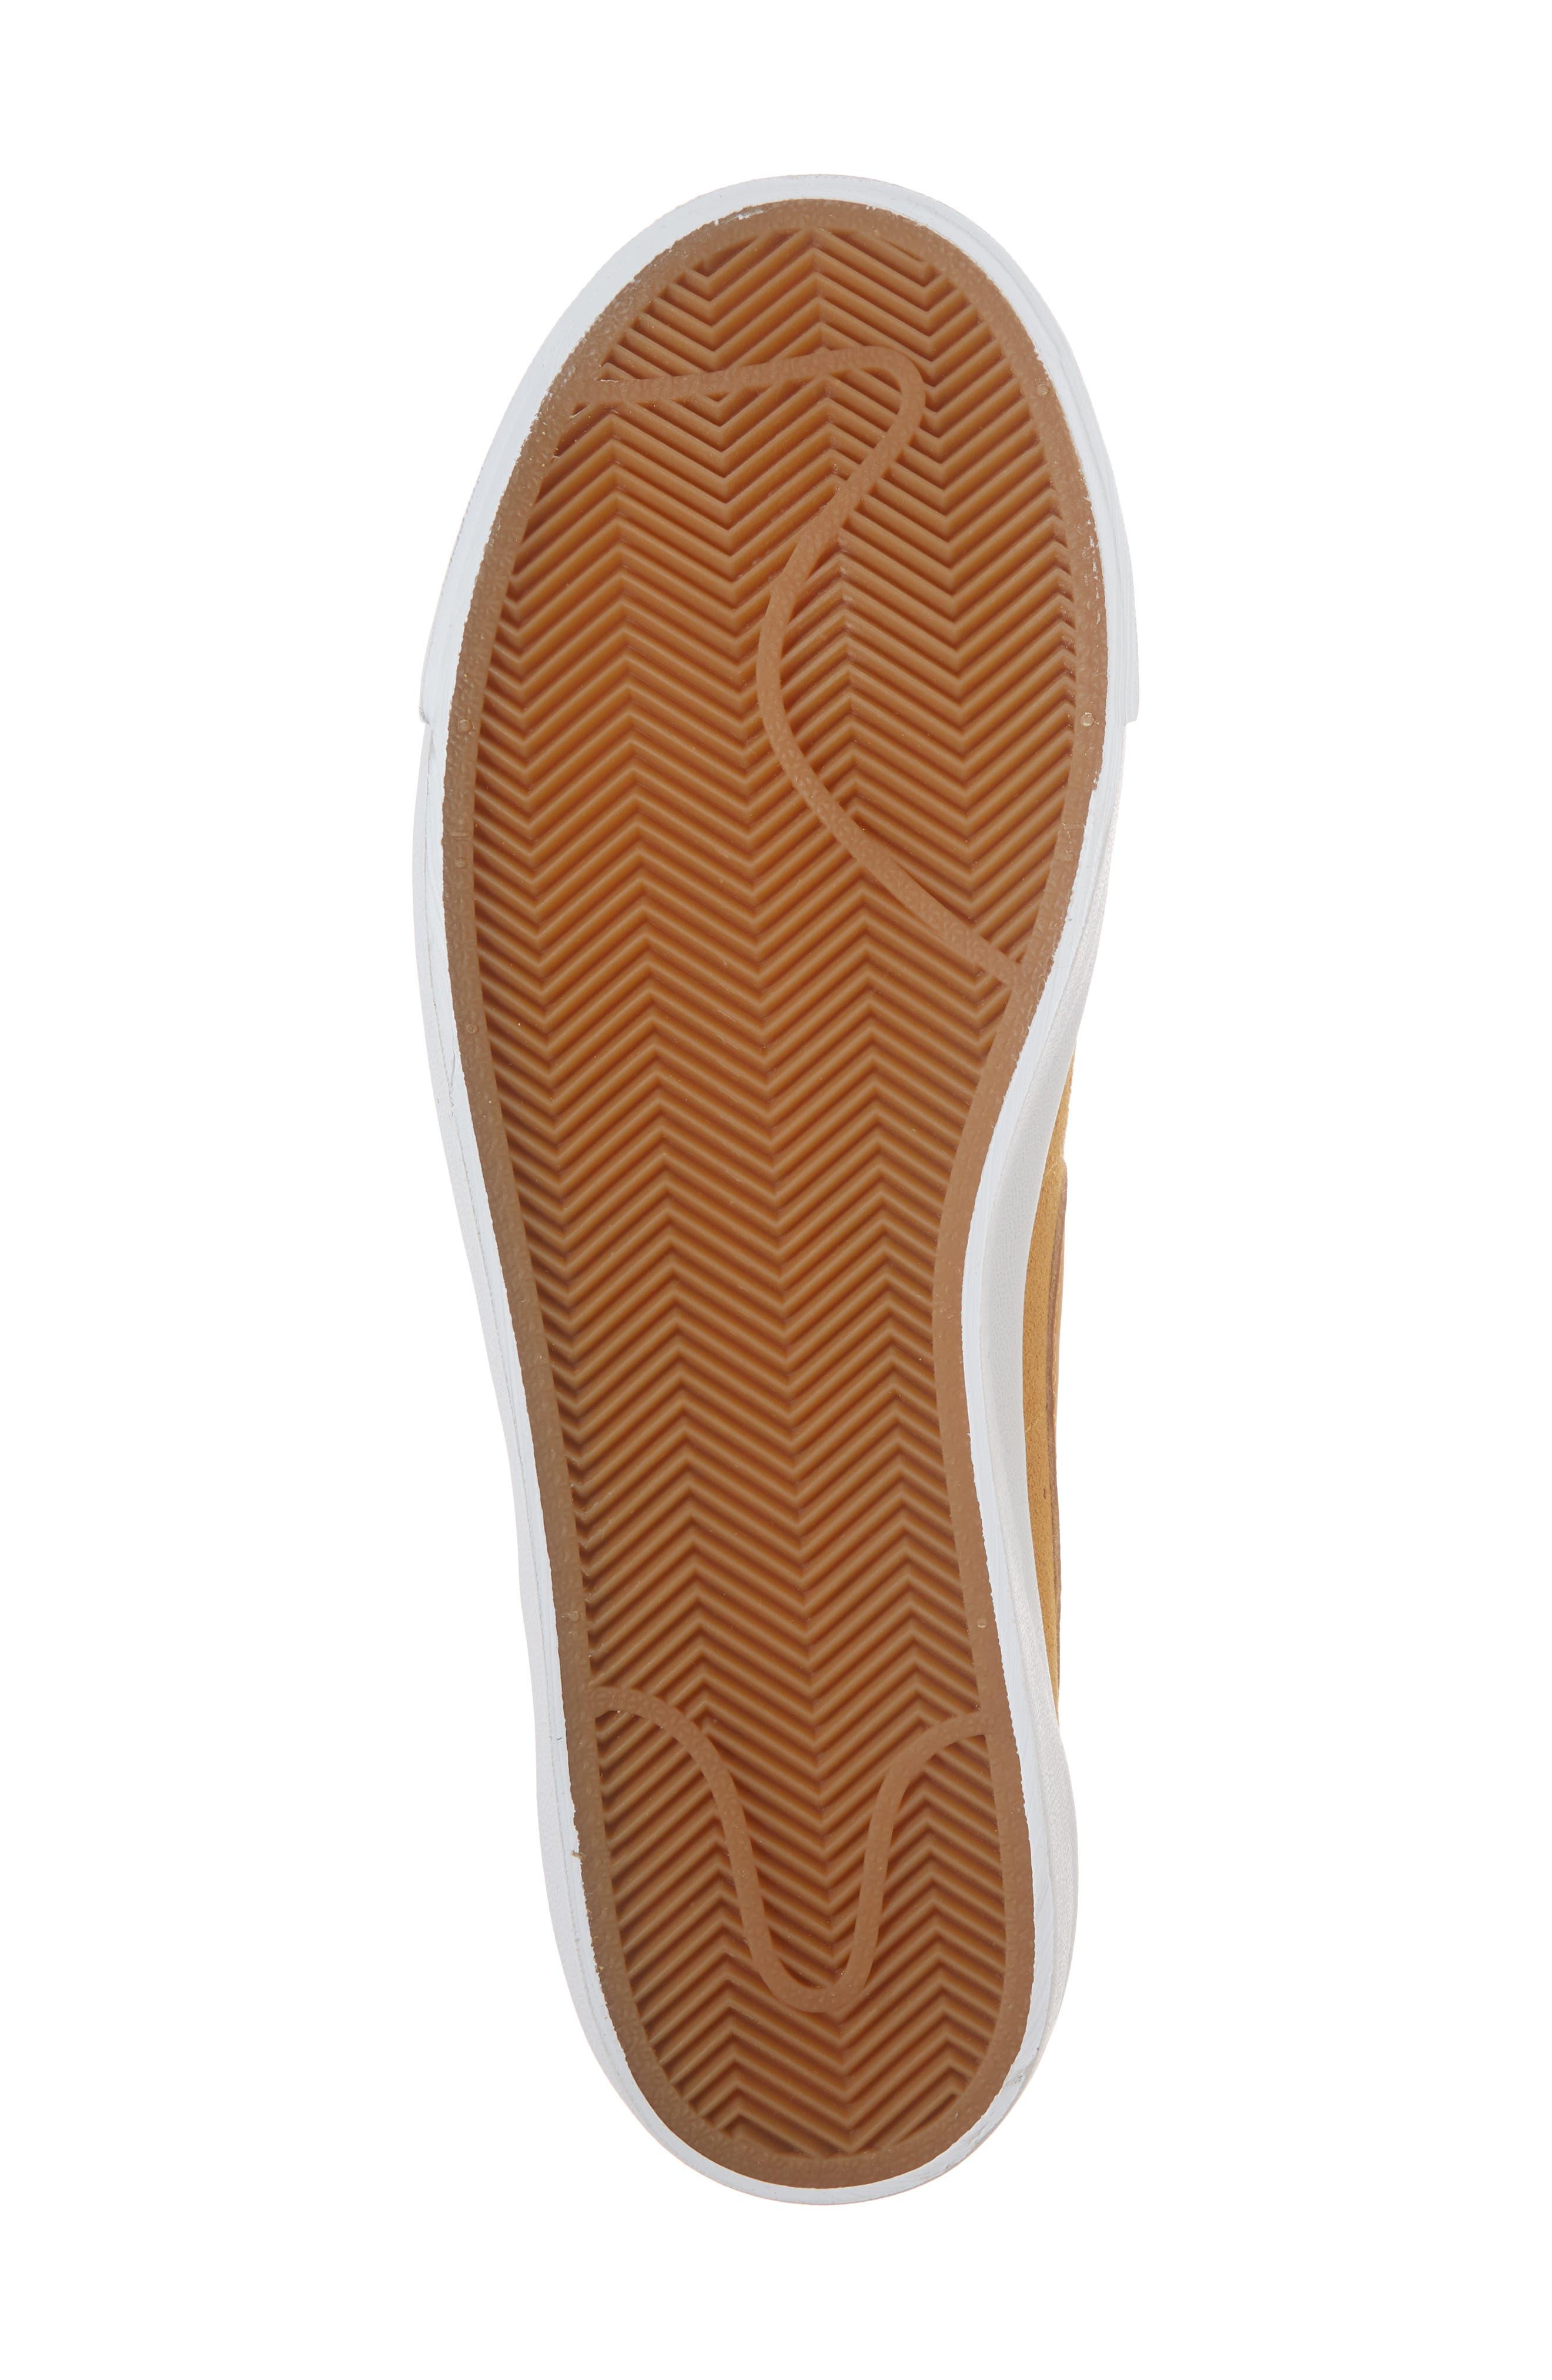 Blazer Low Suede Sneaker,                             Alternate thumbnail 6, color,                             260